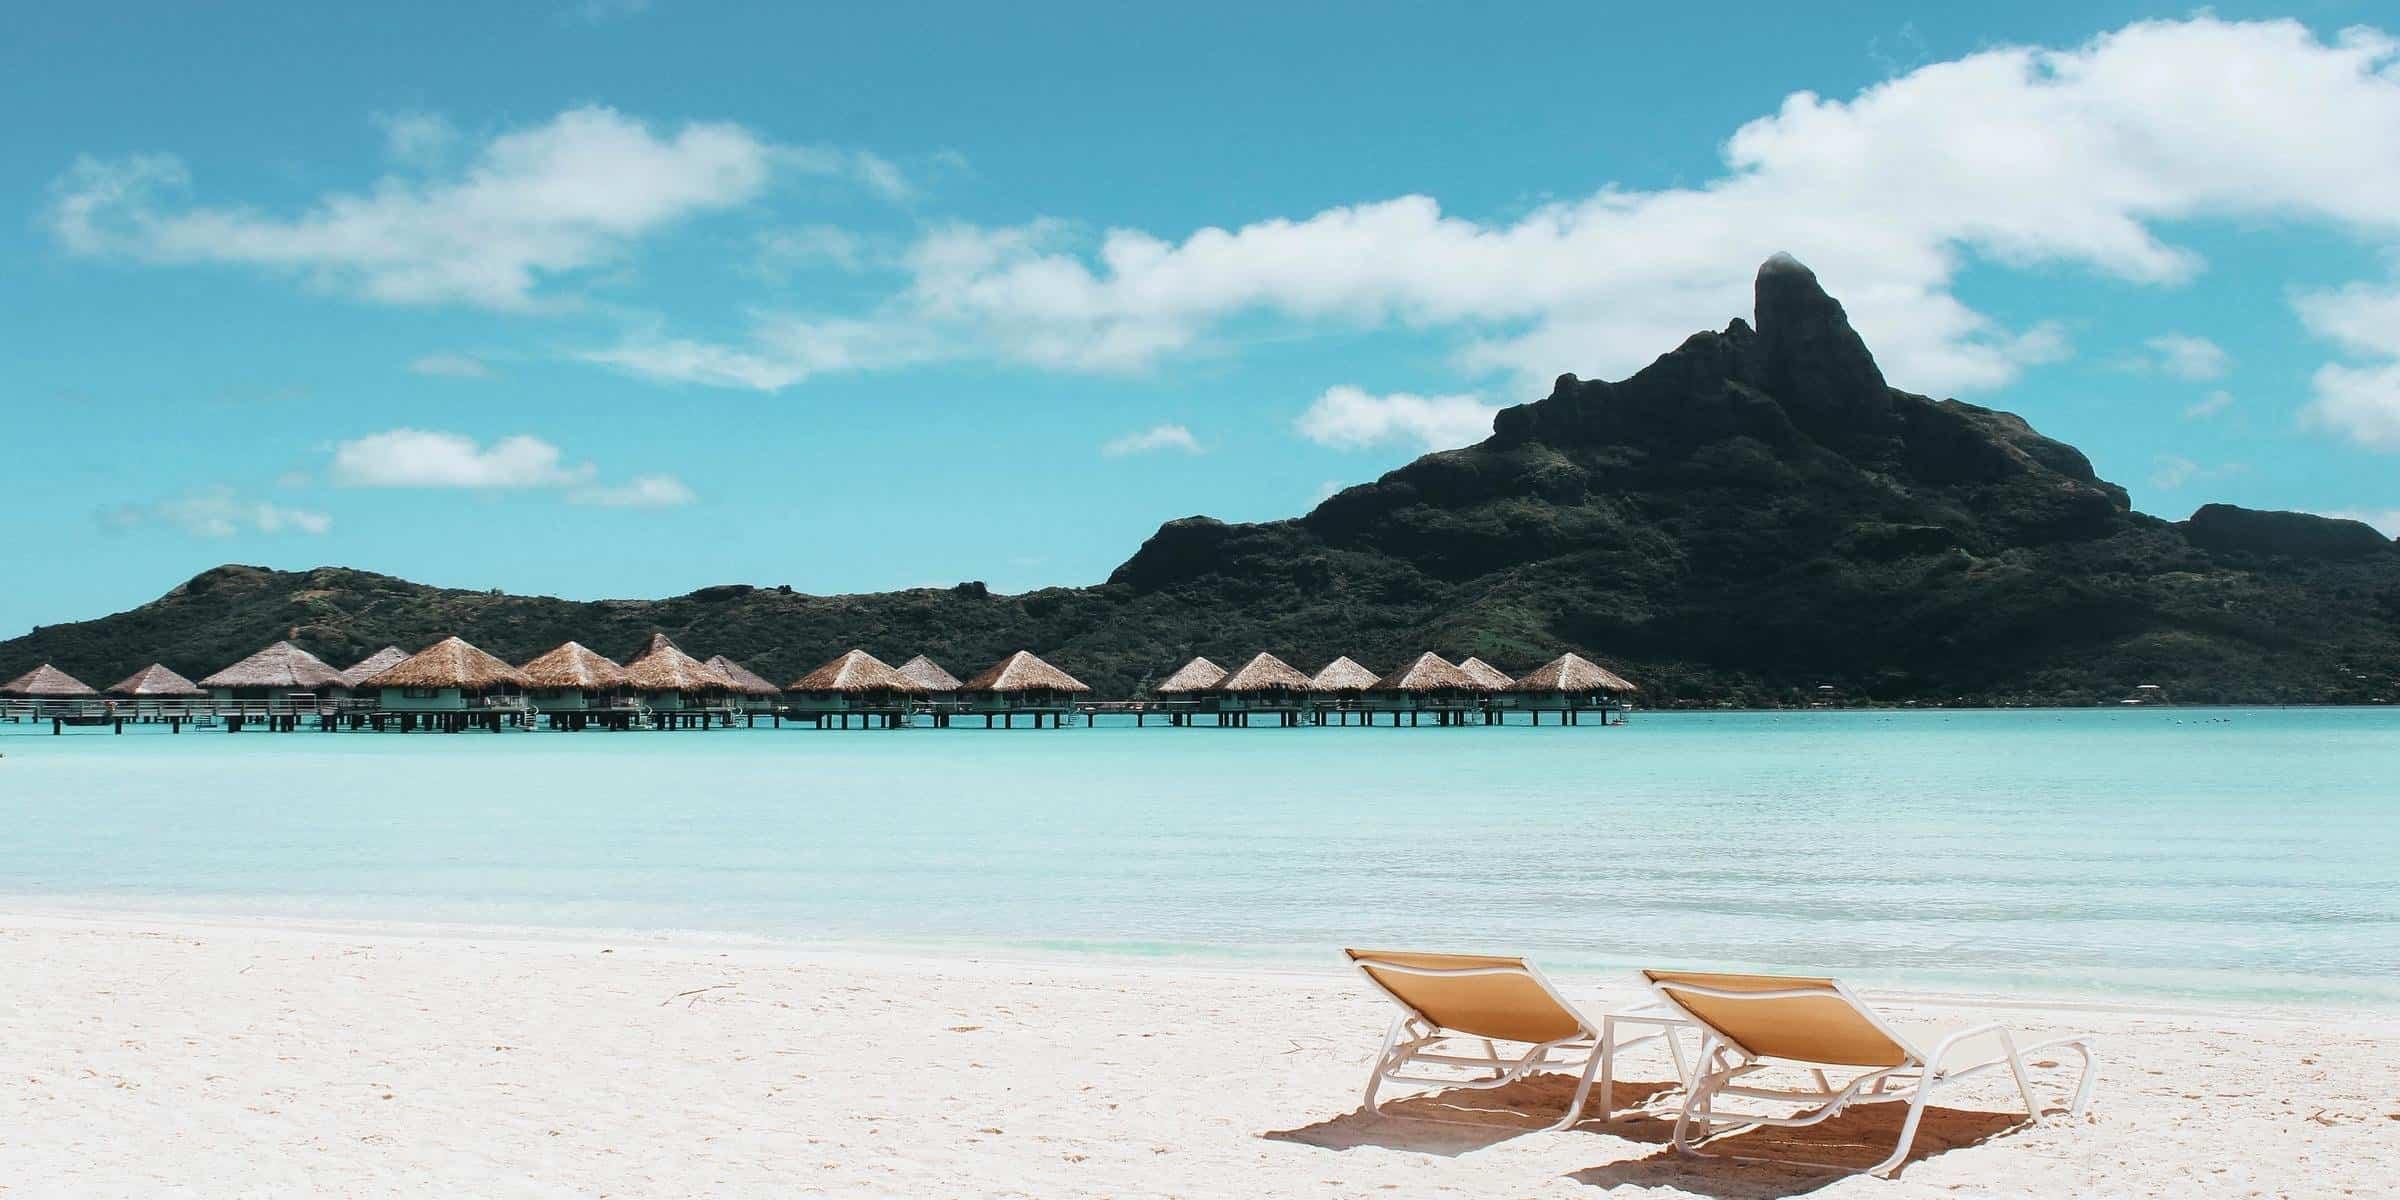 "<img src=""Plaža.jpg"" alt=""2 ležaljke na plaži""/>"